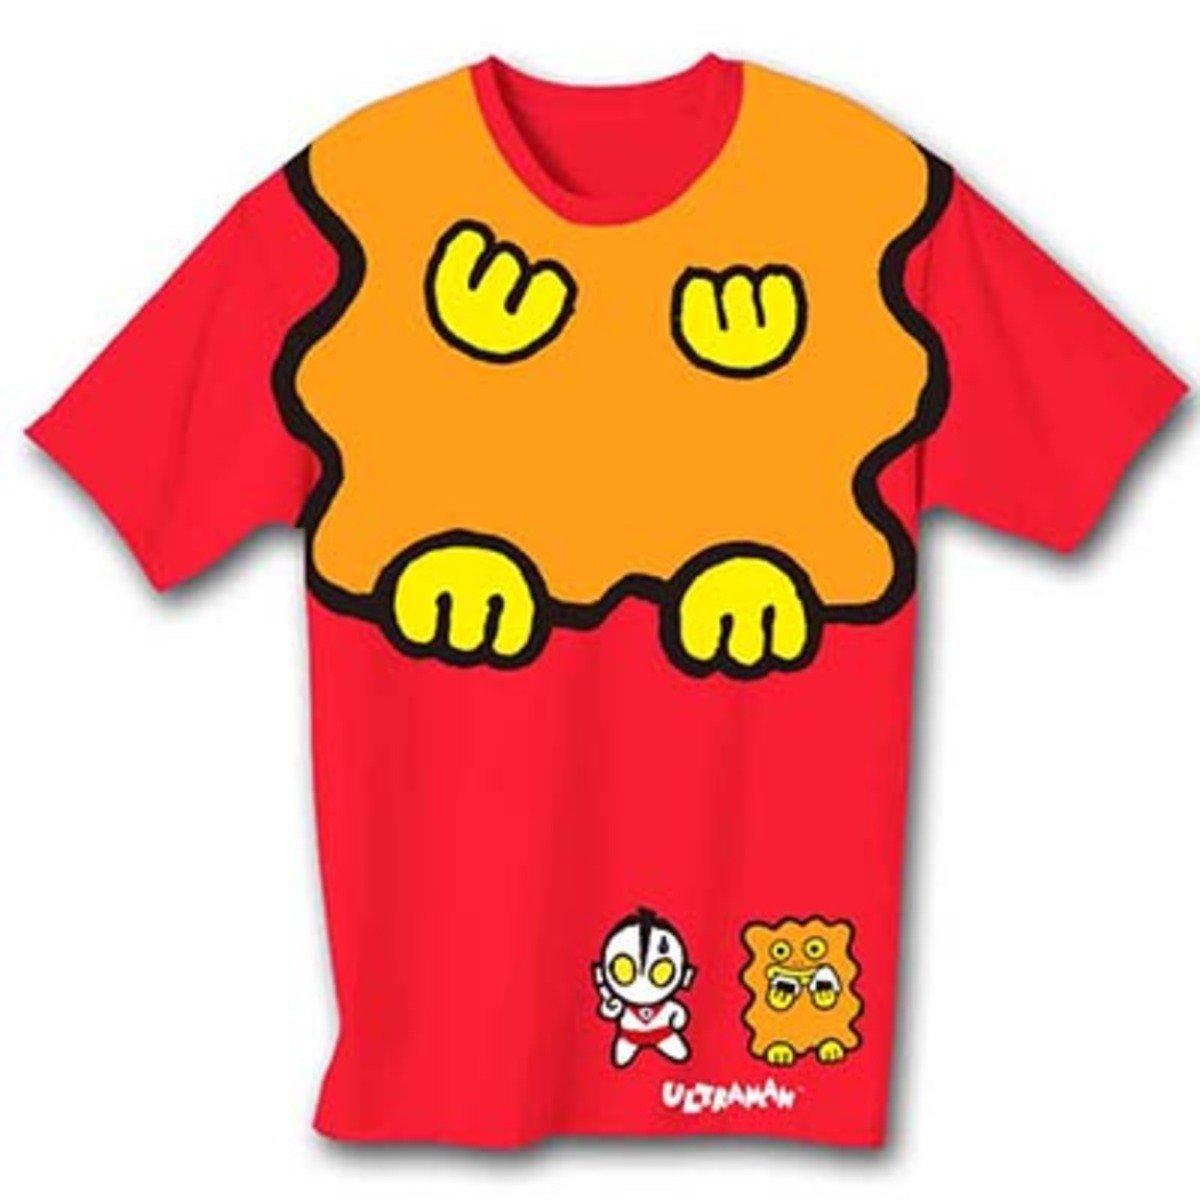 Q版怪獸T-Shirt - Pigmon